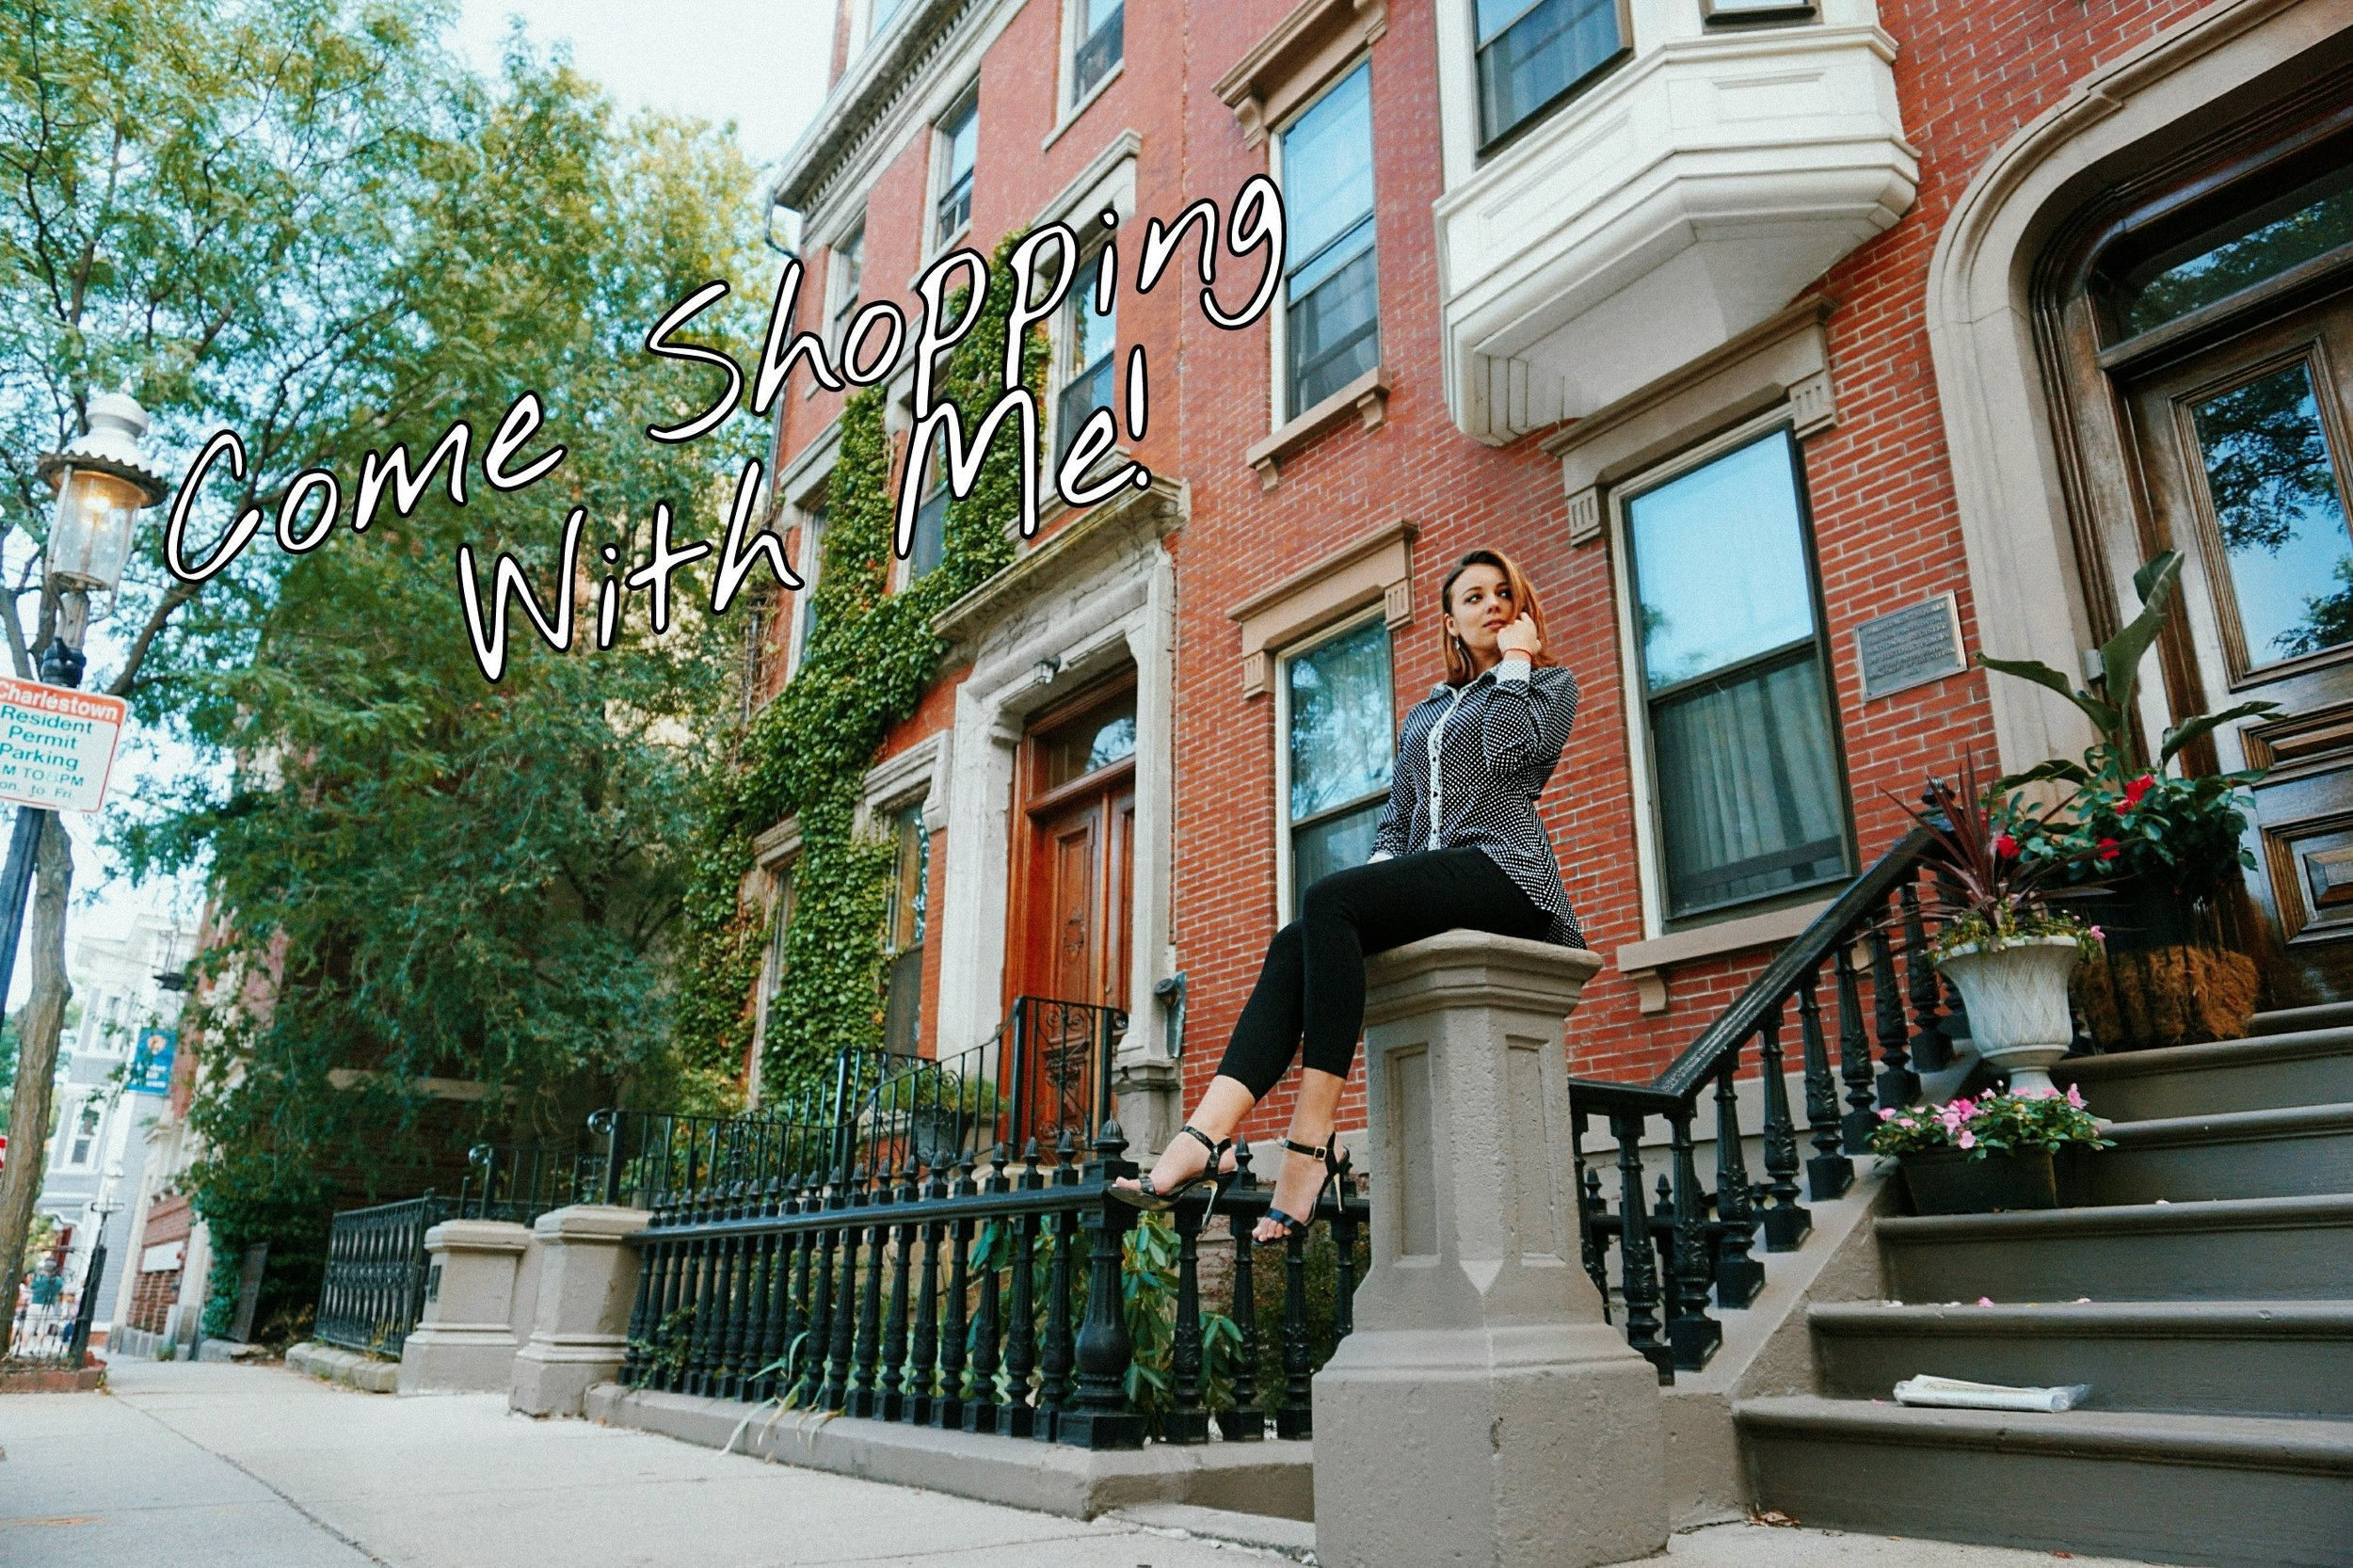 A blogger sitting near the brick house.